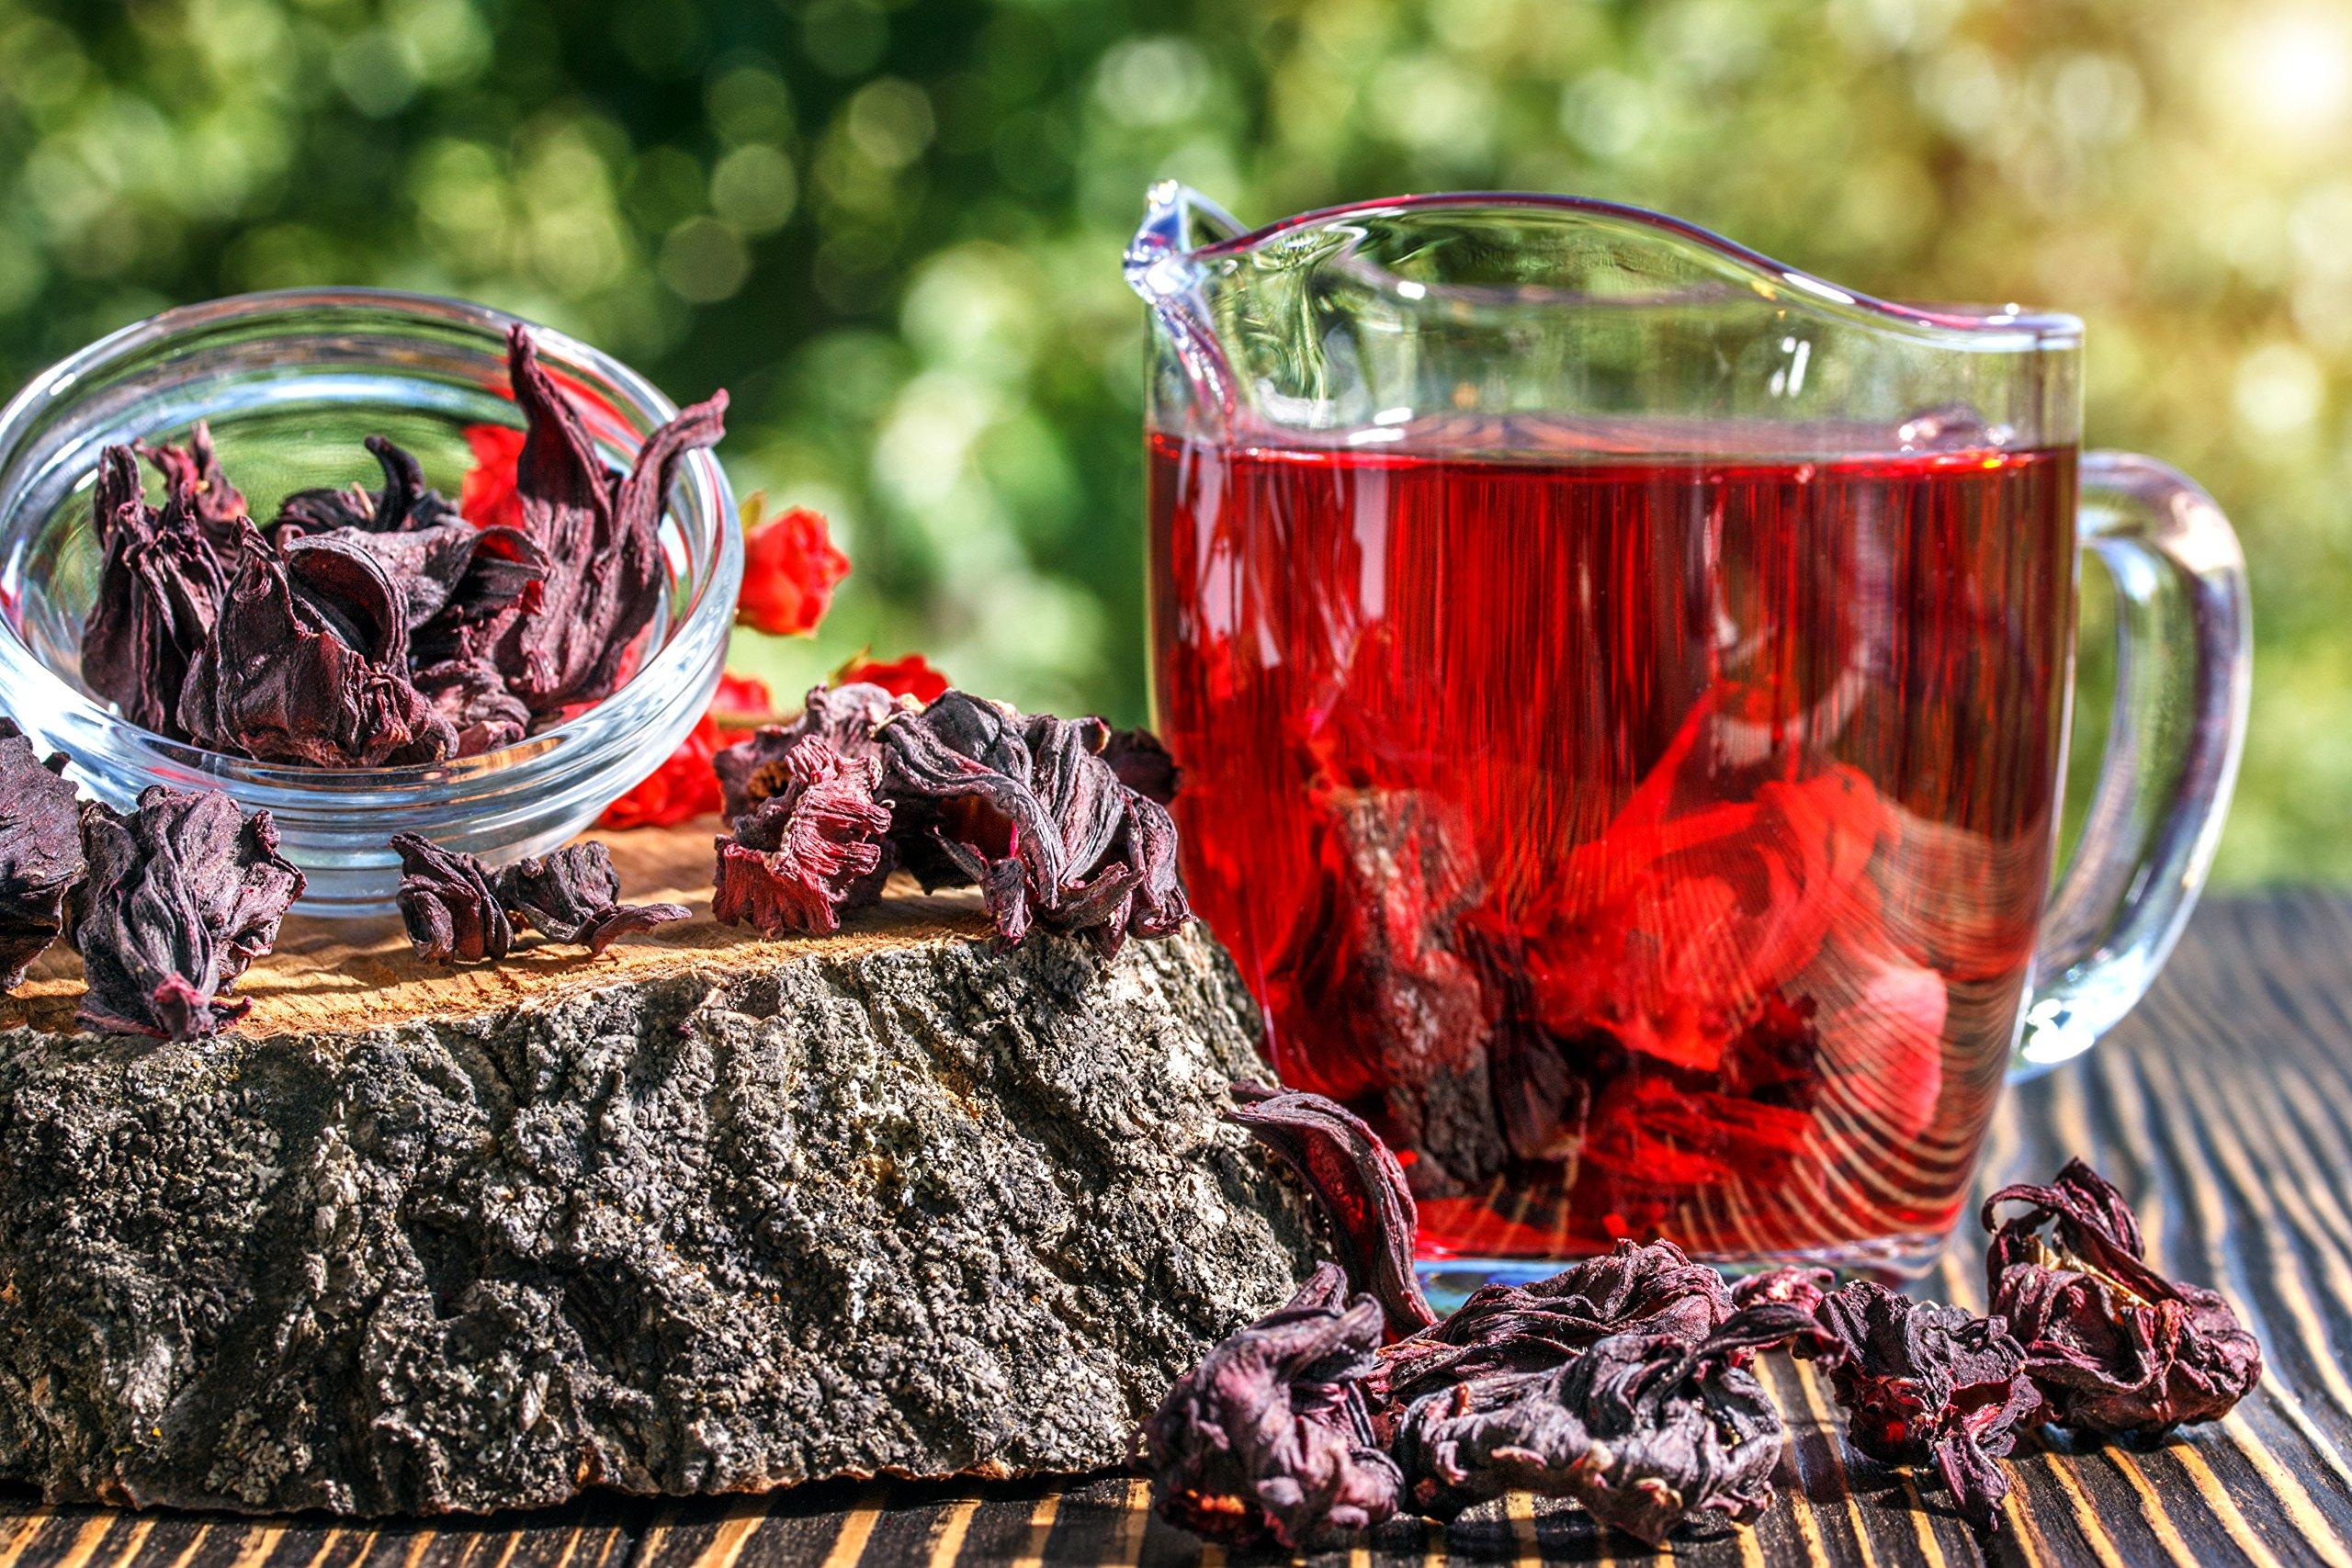 Hibiscus Tea 1LB (16Oz) 100% CERTIFIED Organic Hibiscus Flowers Herbal Tea (WHOLE PETALS), Caffeine Free in 1 lbs. Bulk Resealable Kraft BPA free Bags from U.S. Wellness by U.S. Wellness Naturals (Image #2)